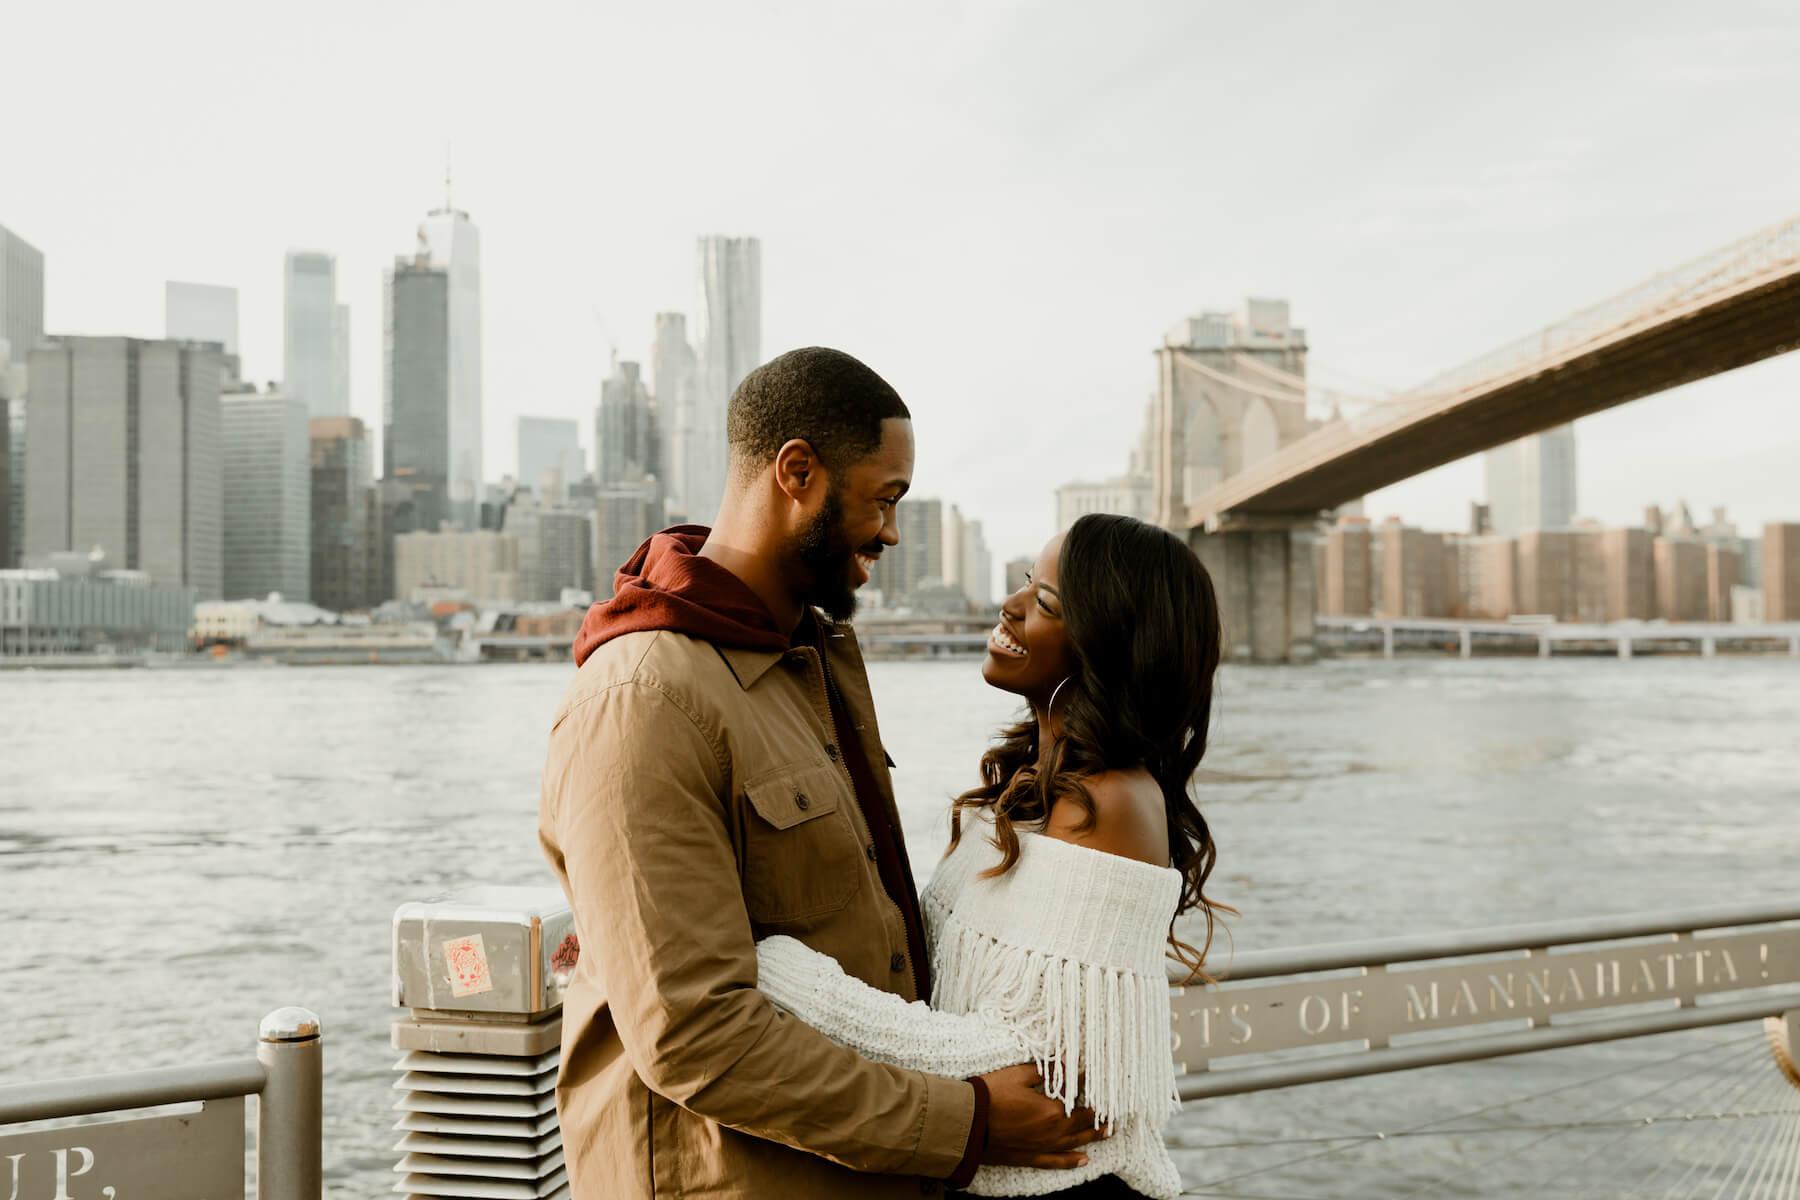 new-york-city-11-21-2019-just-because-6_original